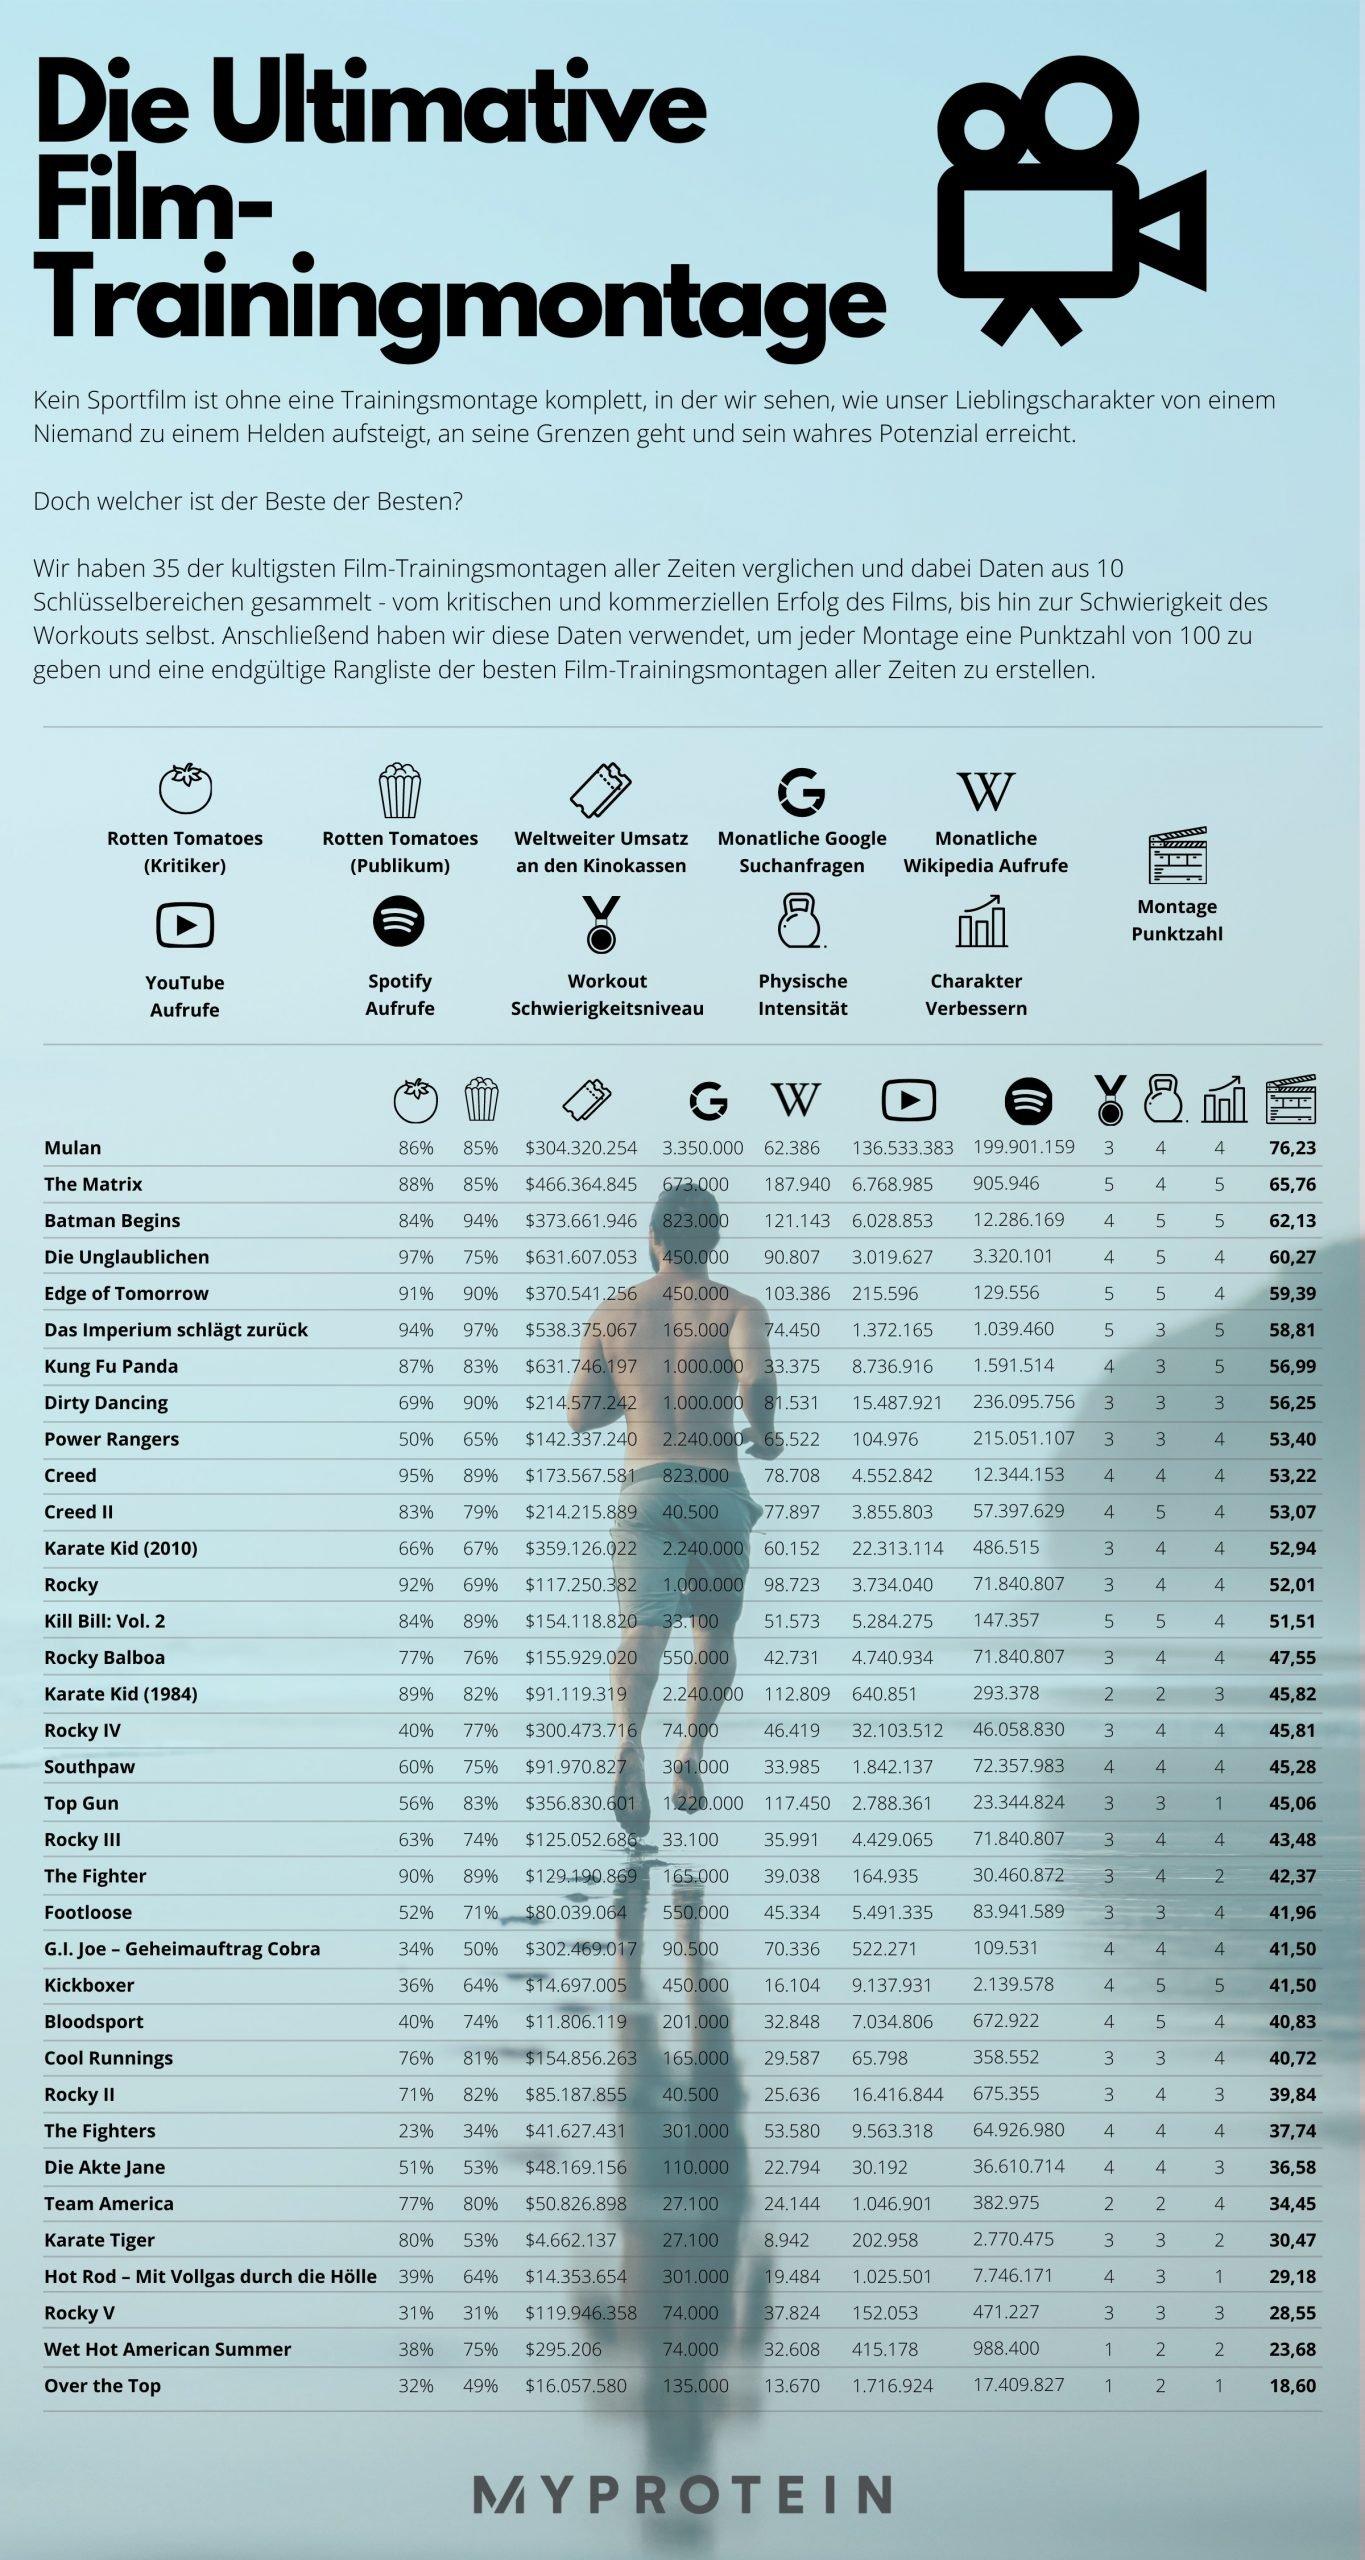 Ultimative Film Trainingmontage Infografik